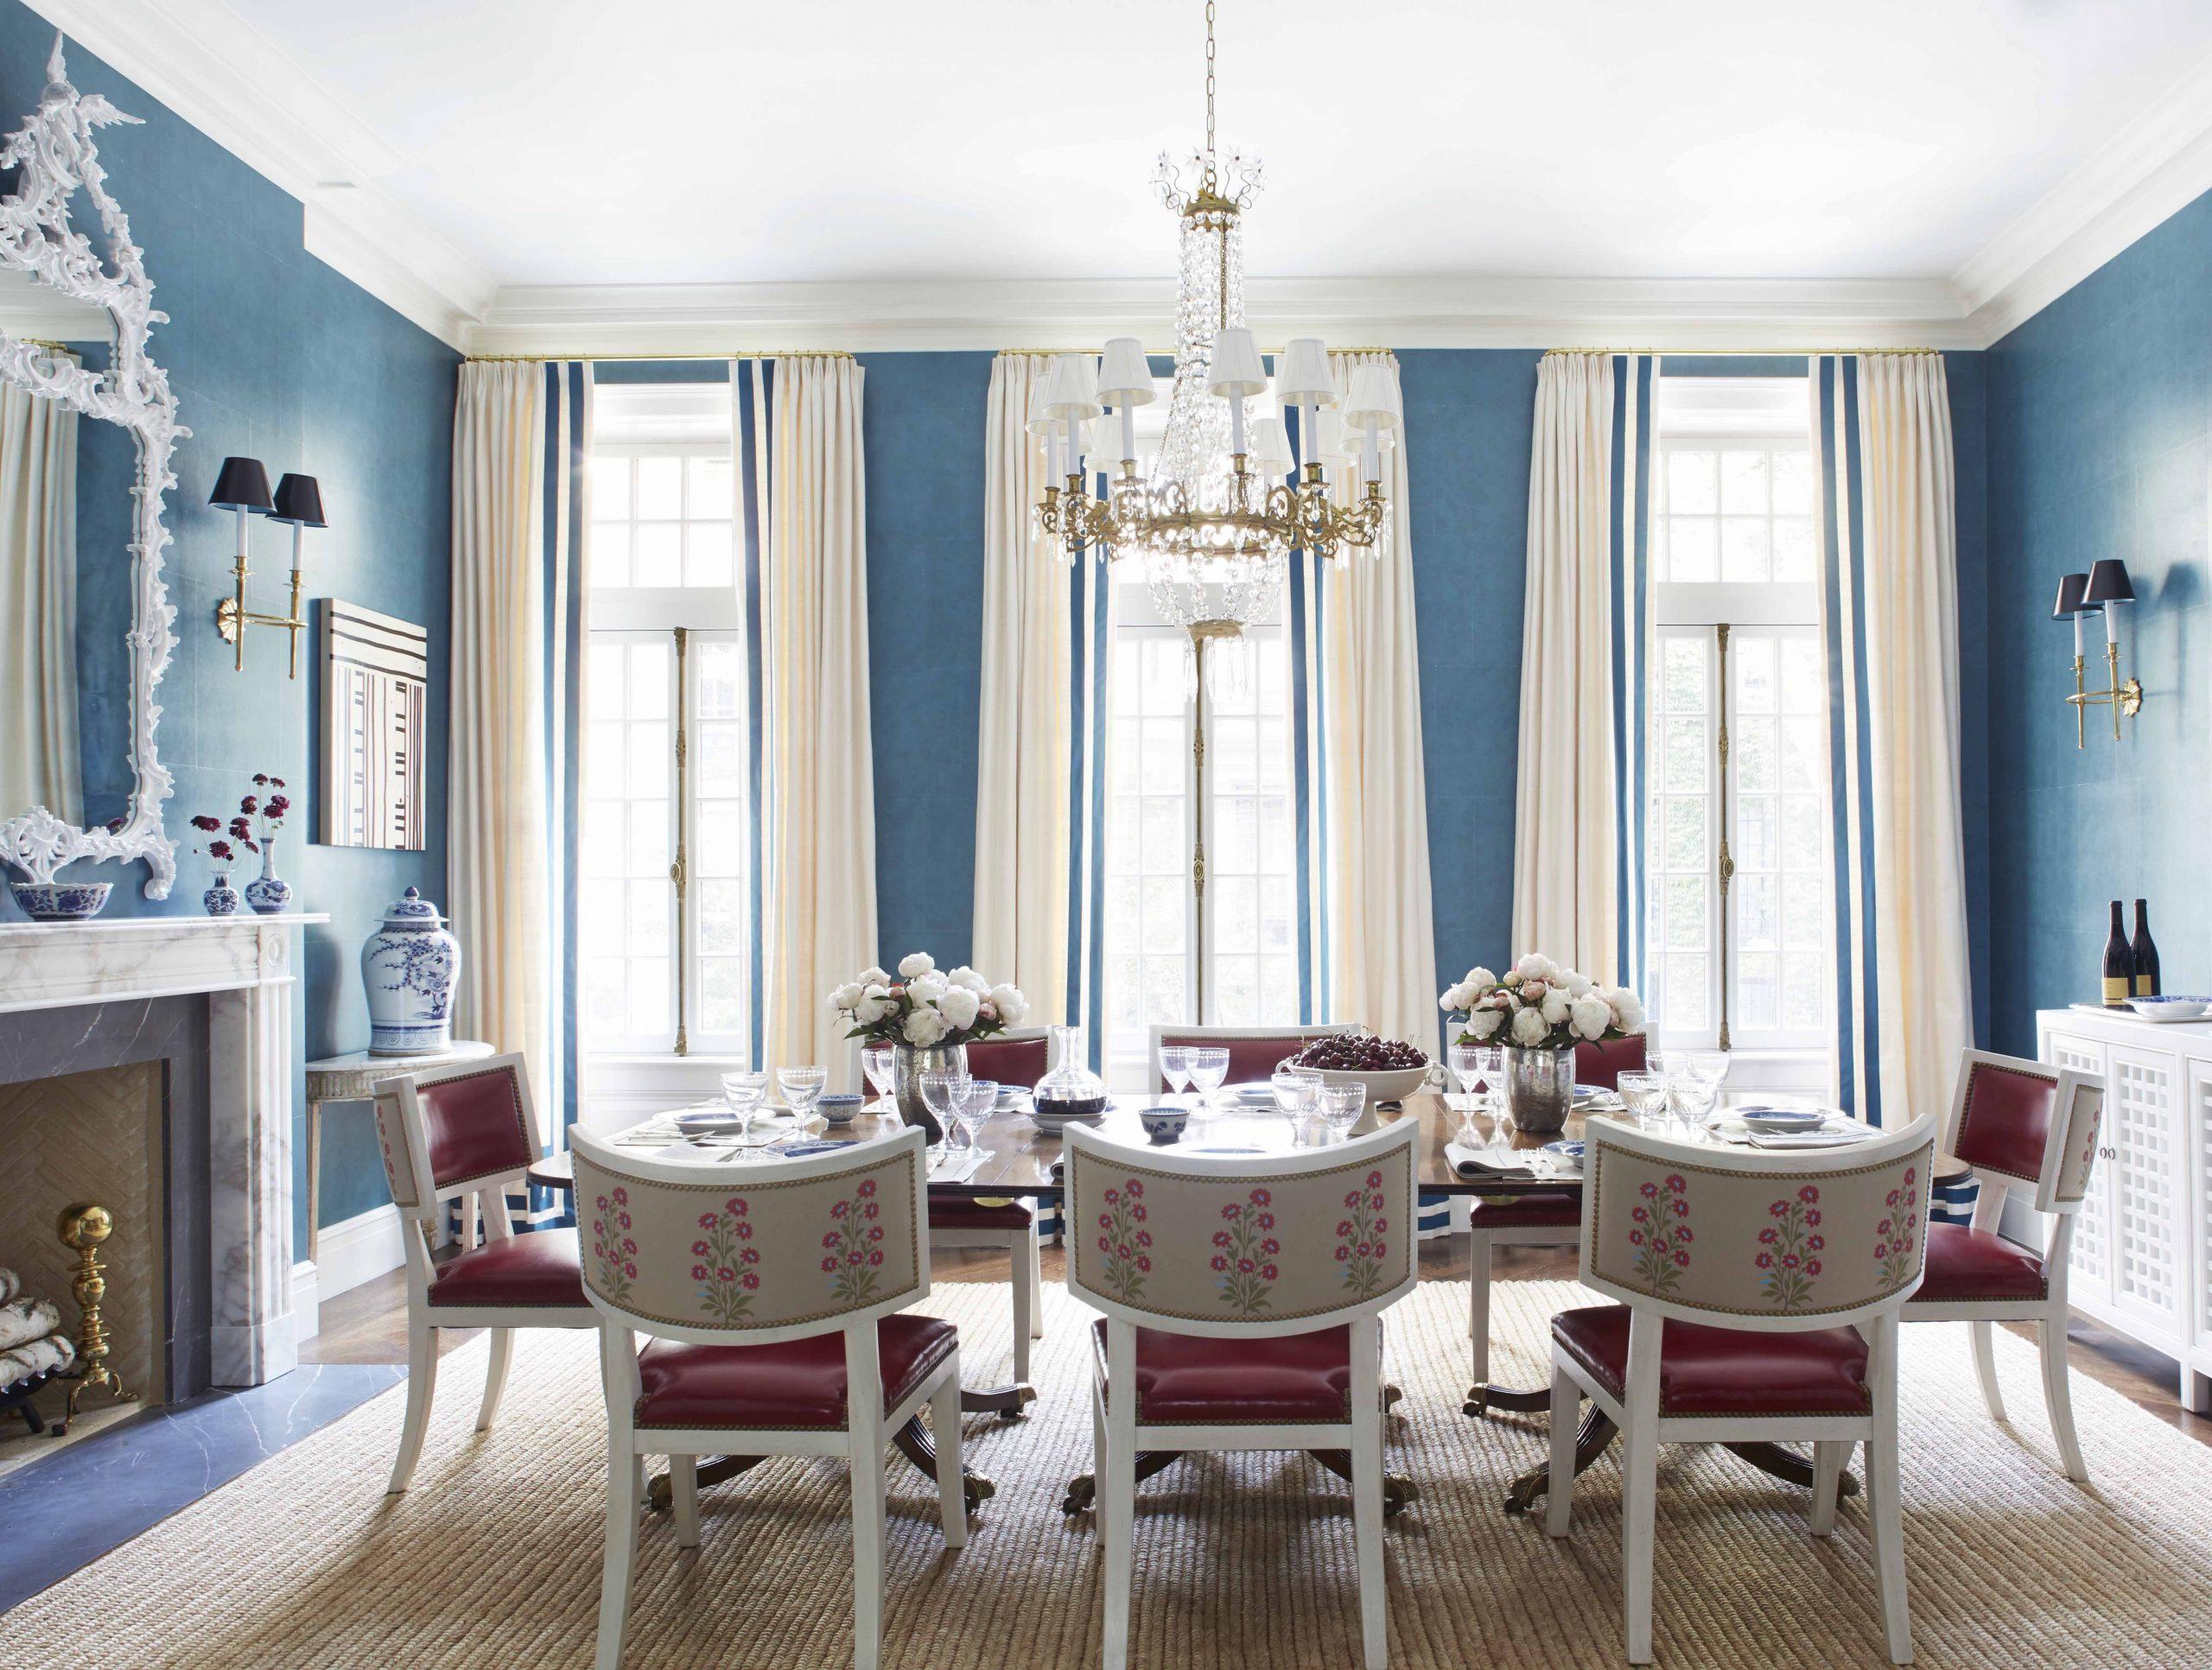 9+ Best Dining Room Ideas – Designer Dining Rooms & Decor - Dining Room Ideas Images